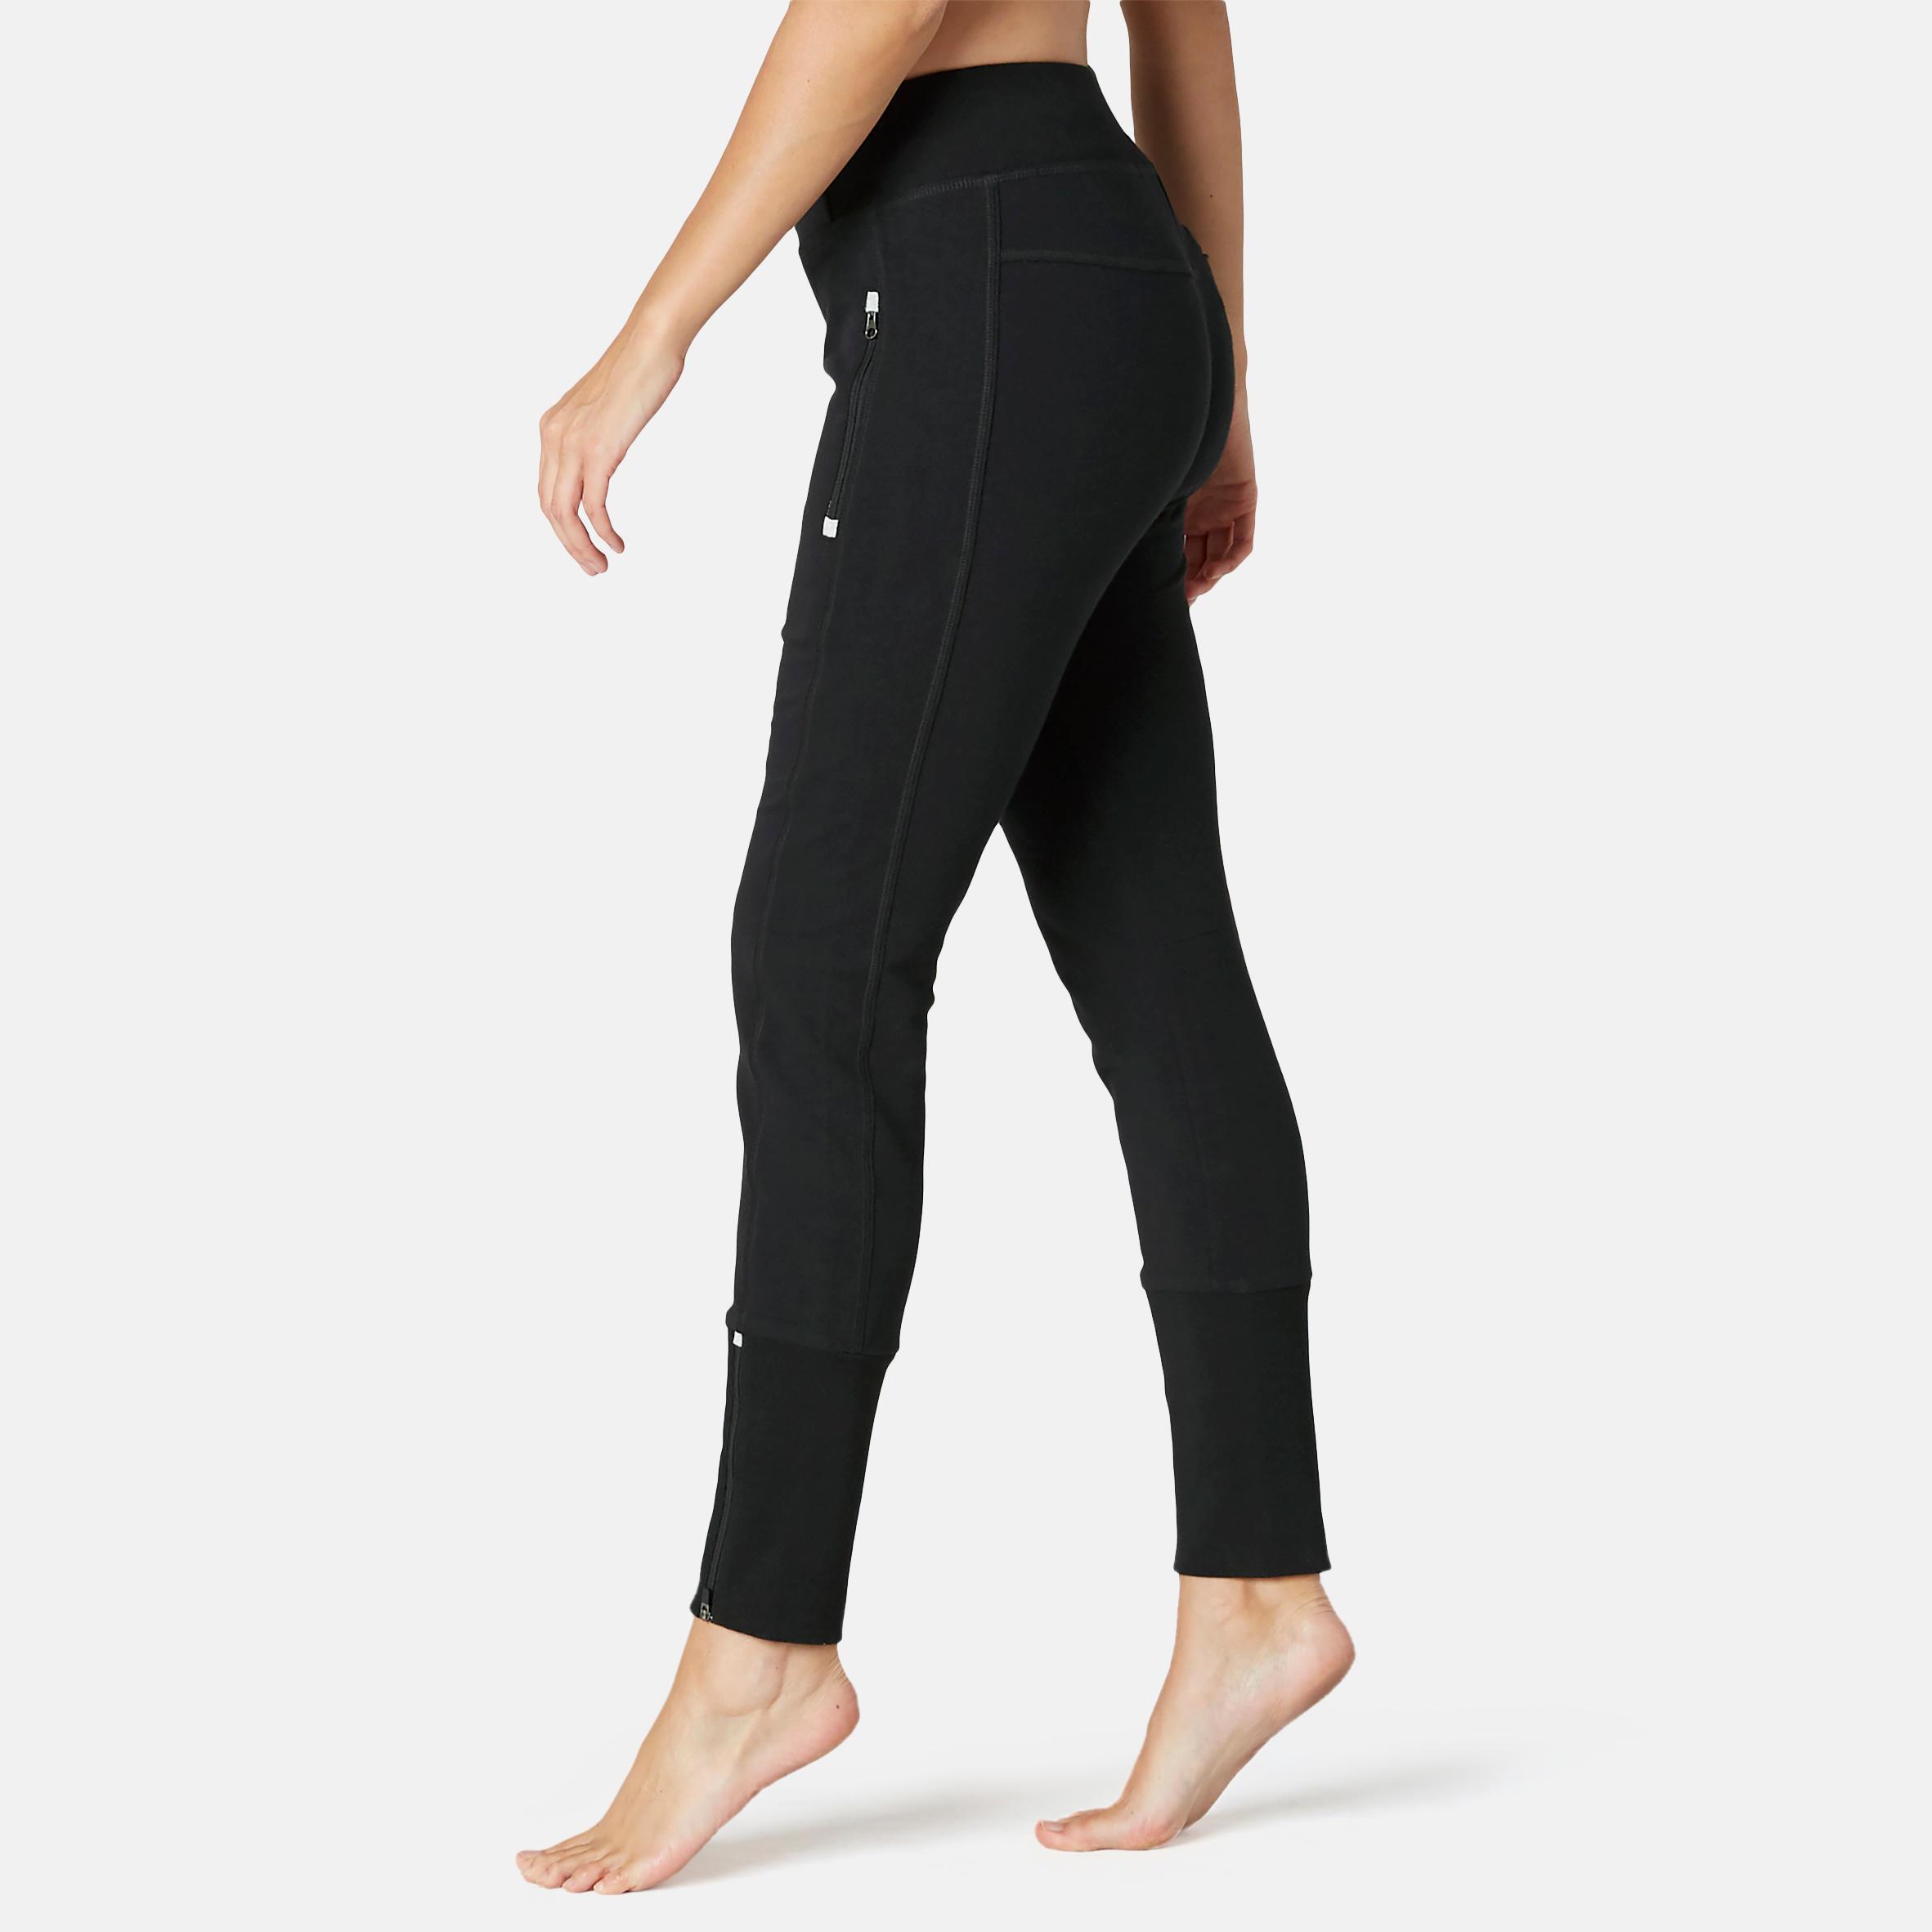 Pantalon Slim 520 negru damă imagine